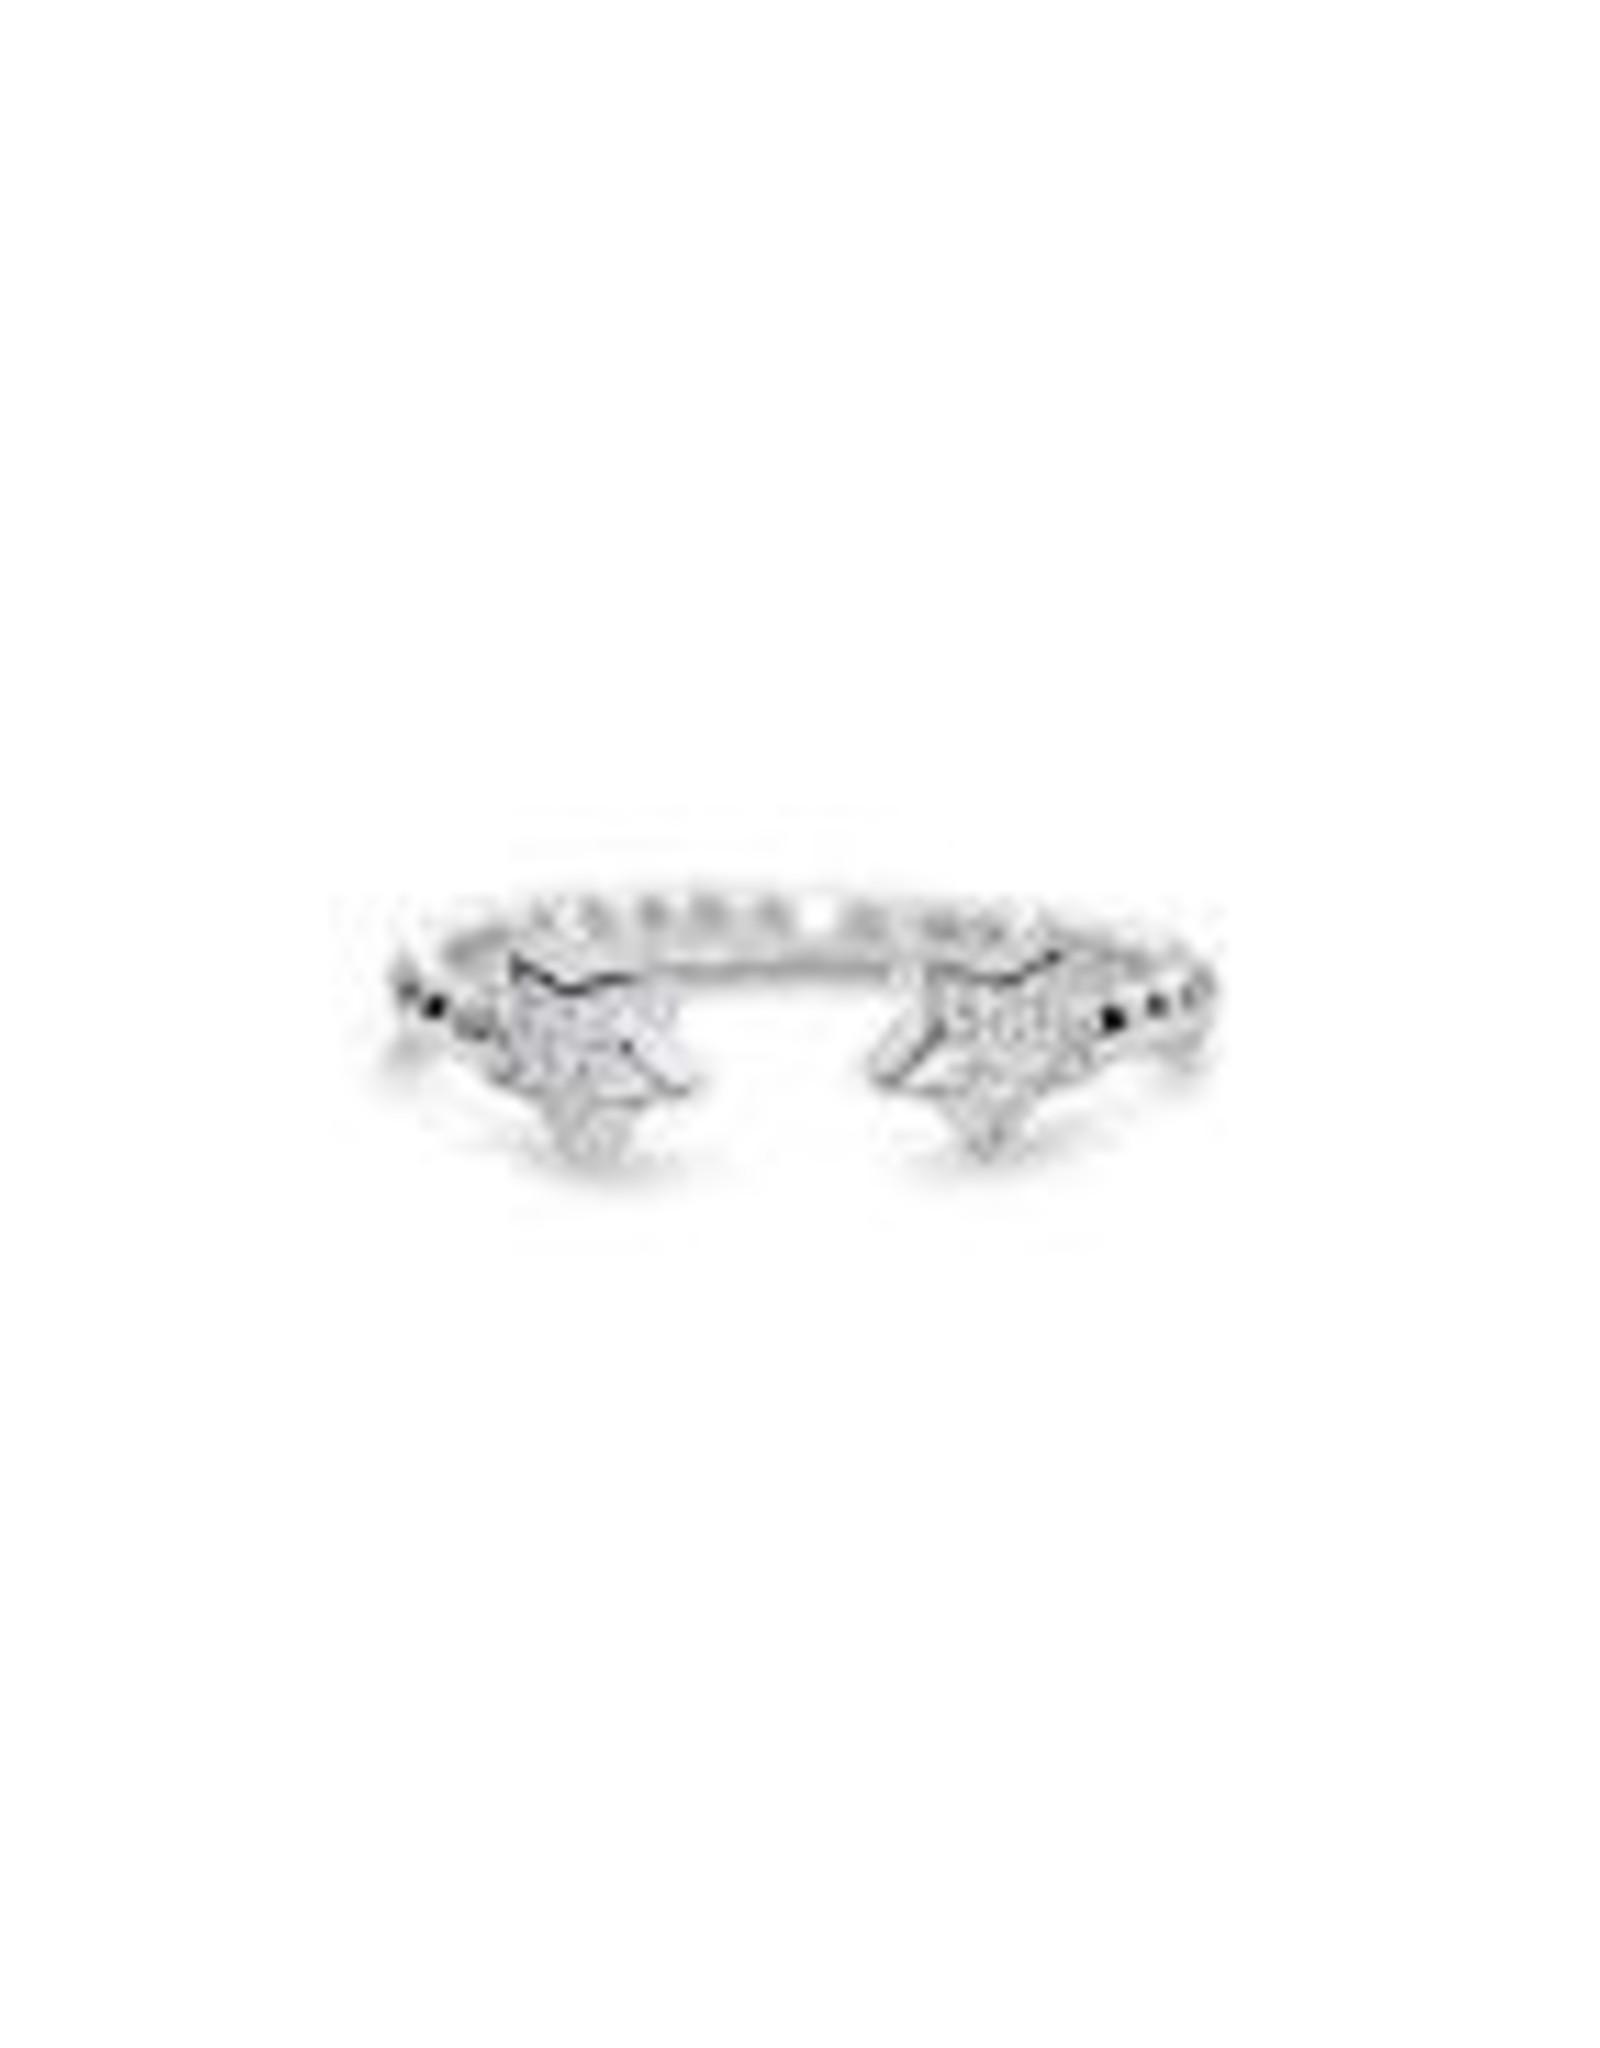 Stia Jewelry Droplet Wire Ring - Star